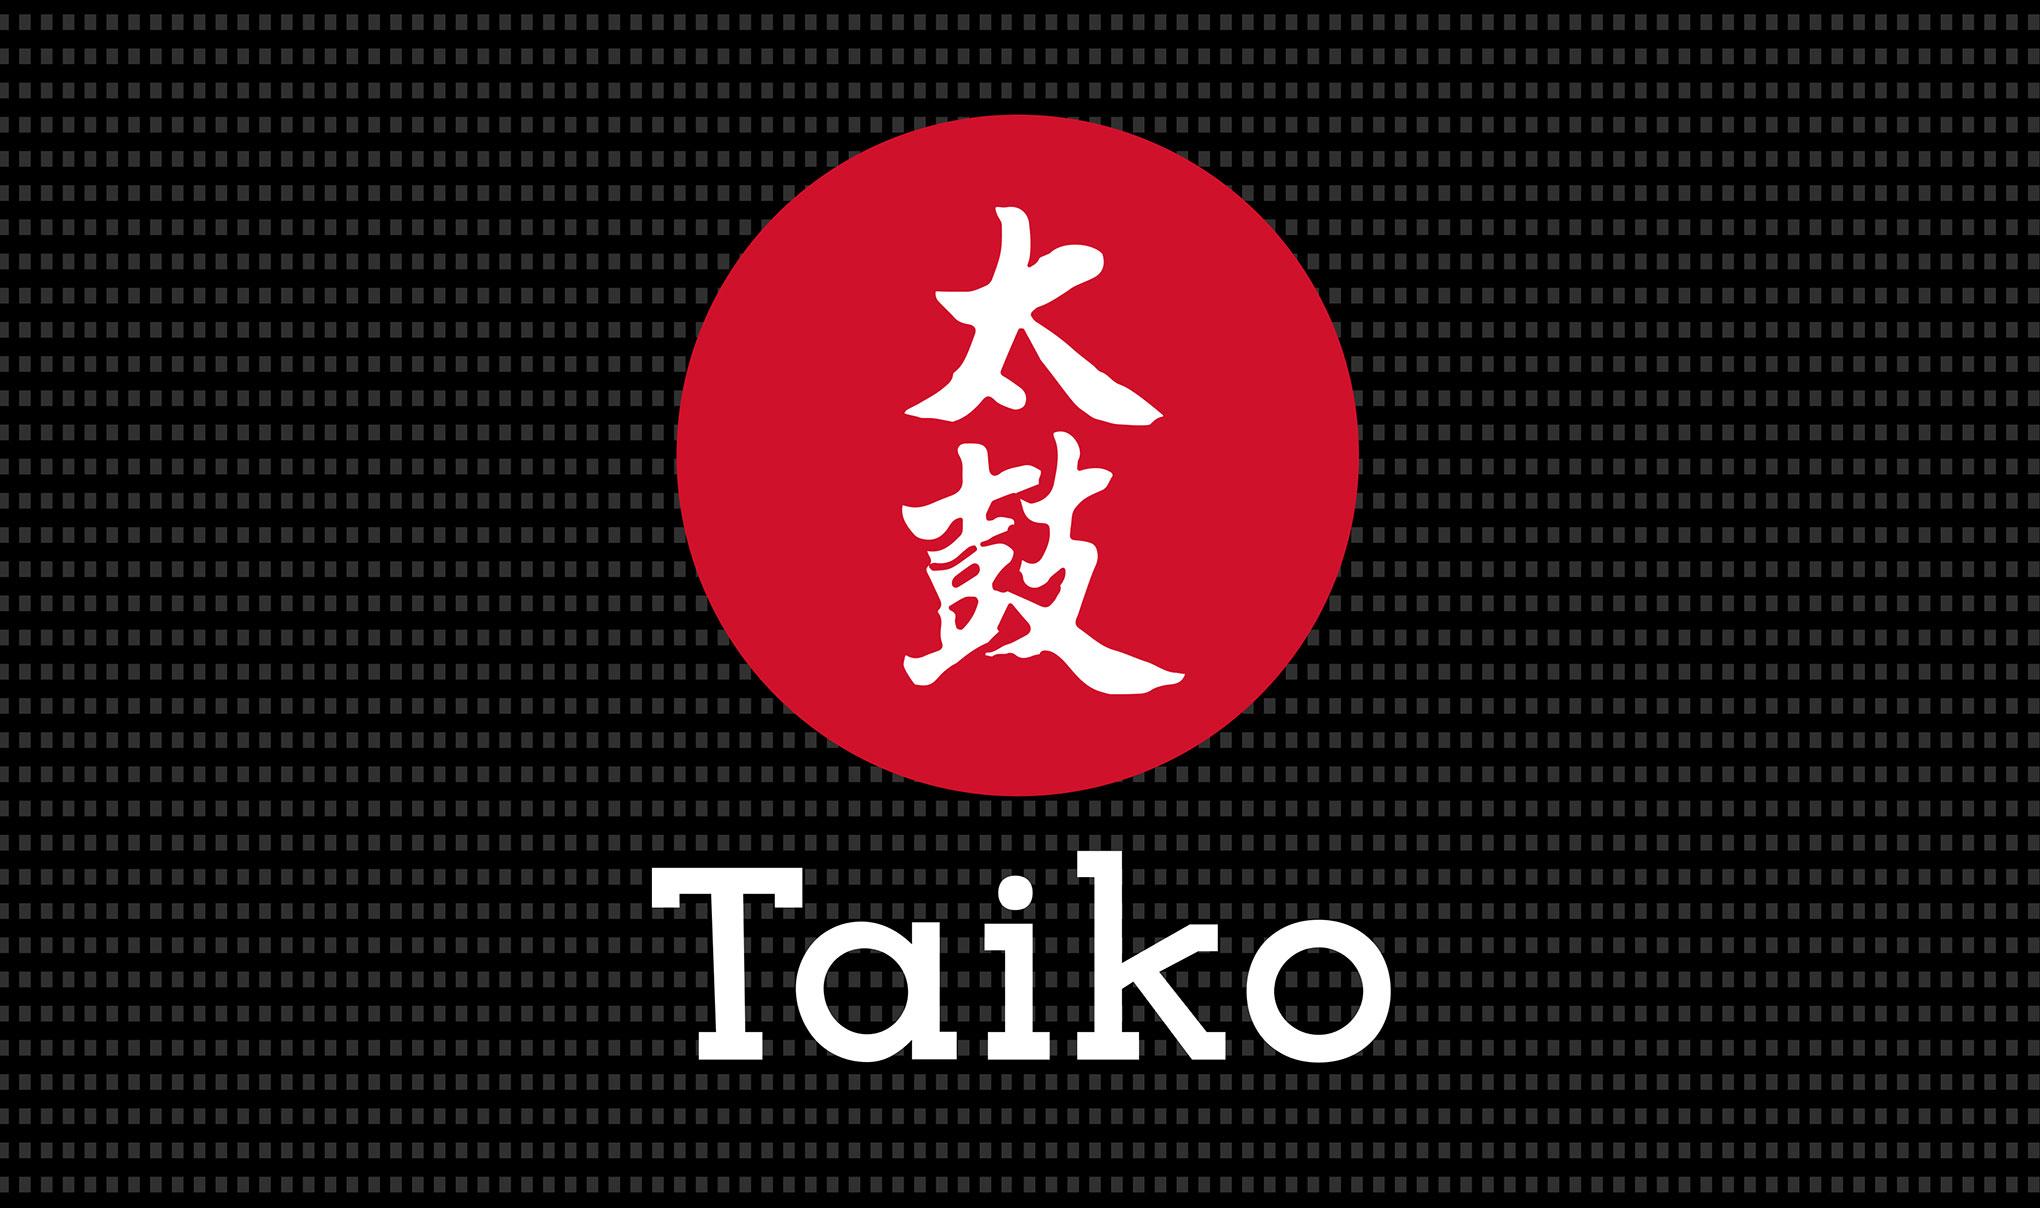 Taiko Sushi primary brand logo design.